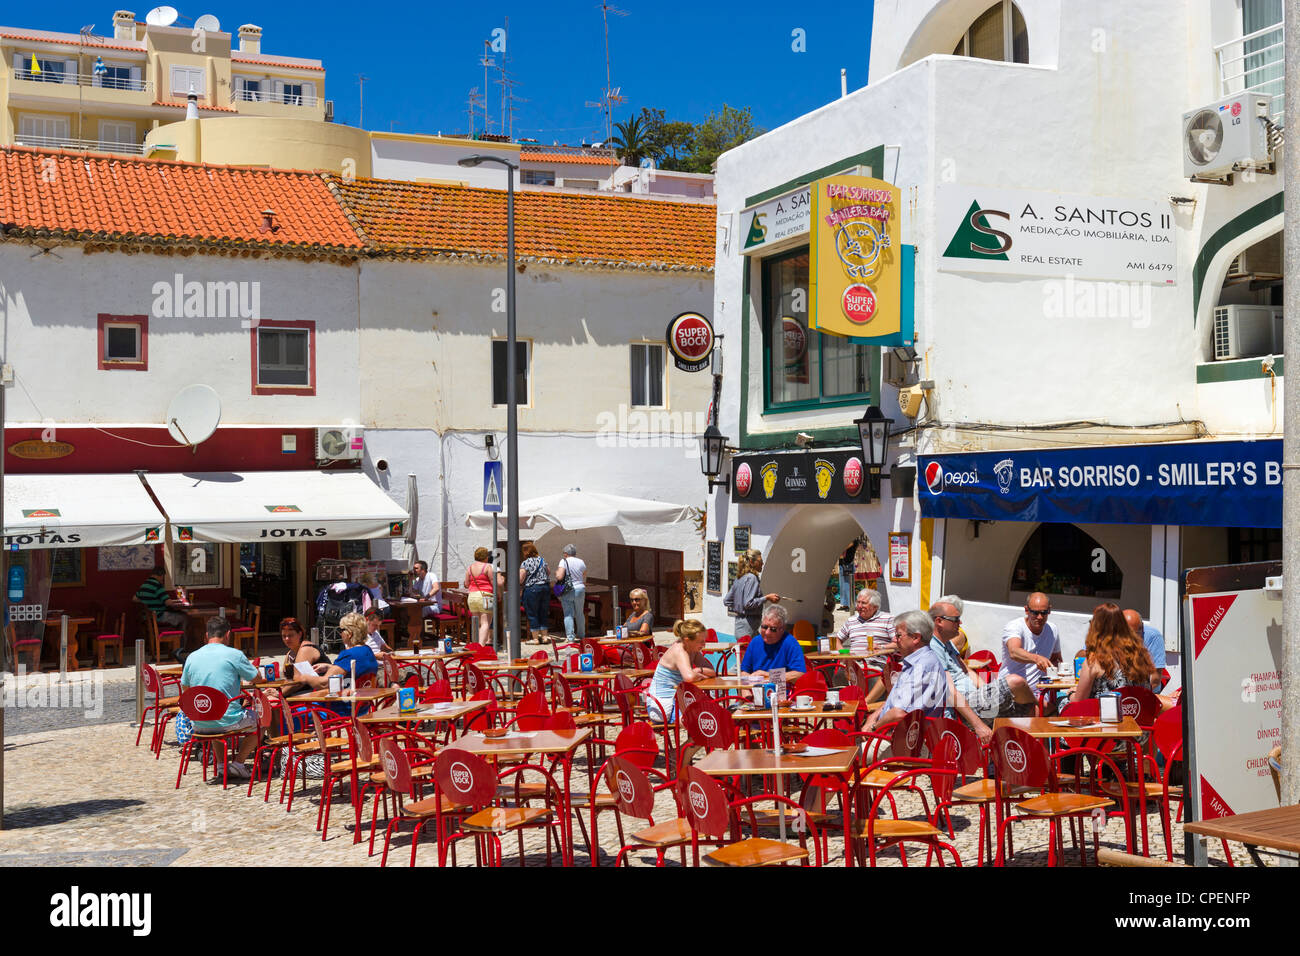 Cafe in the resort centre, Carvoeiro, Algarve, Portugal Stock Photo